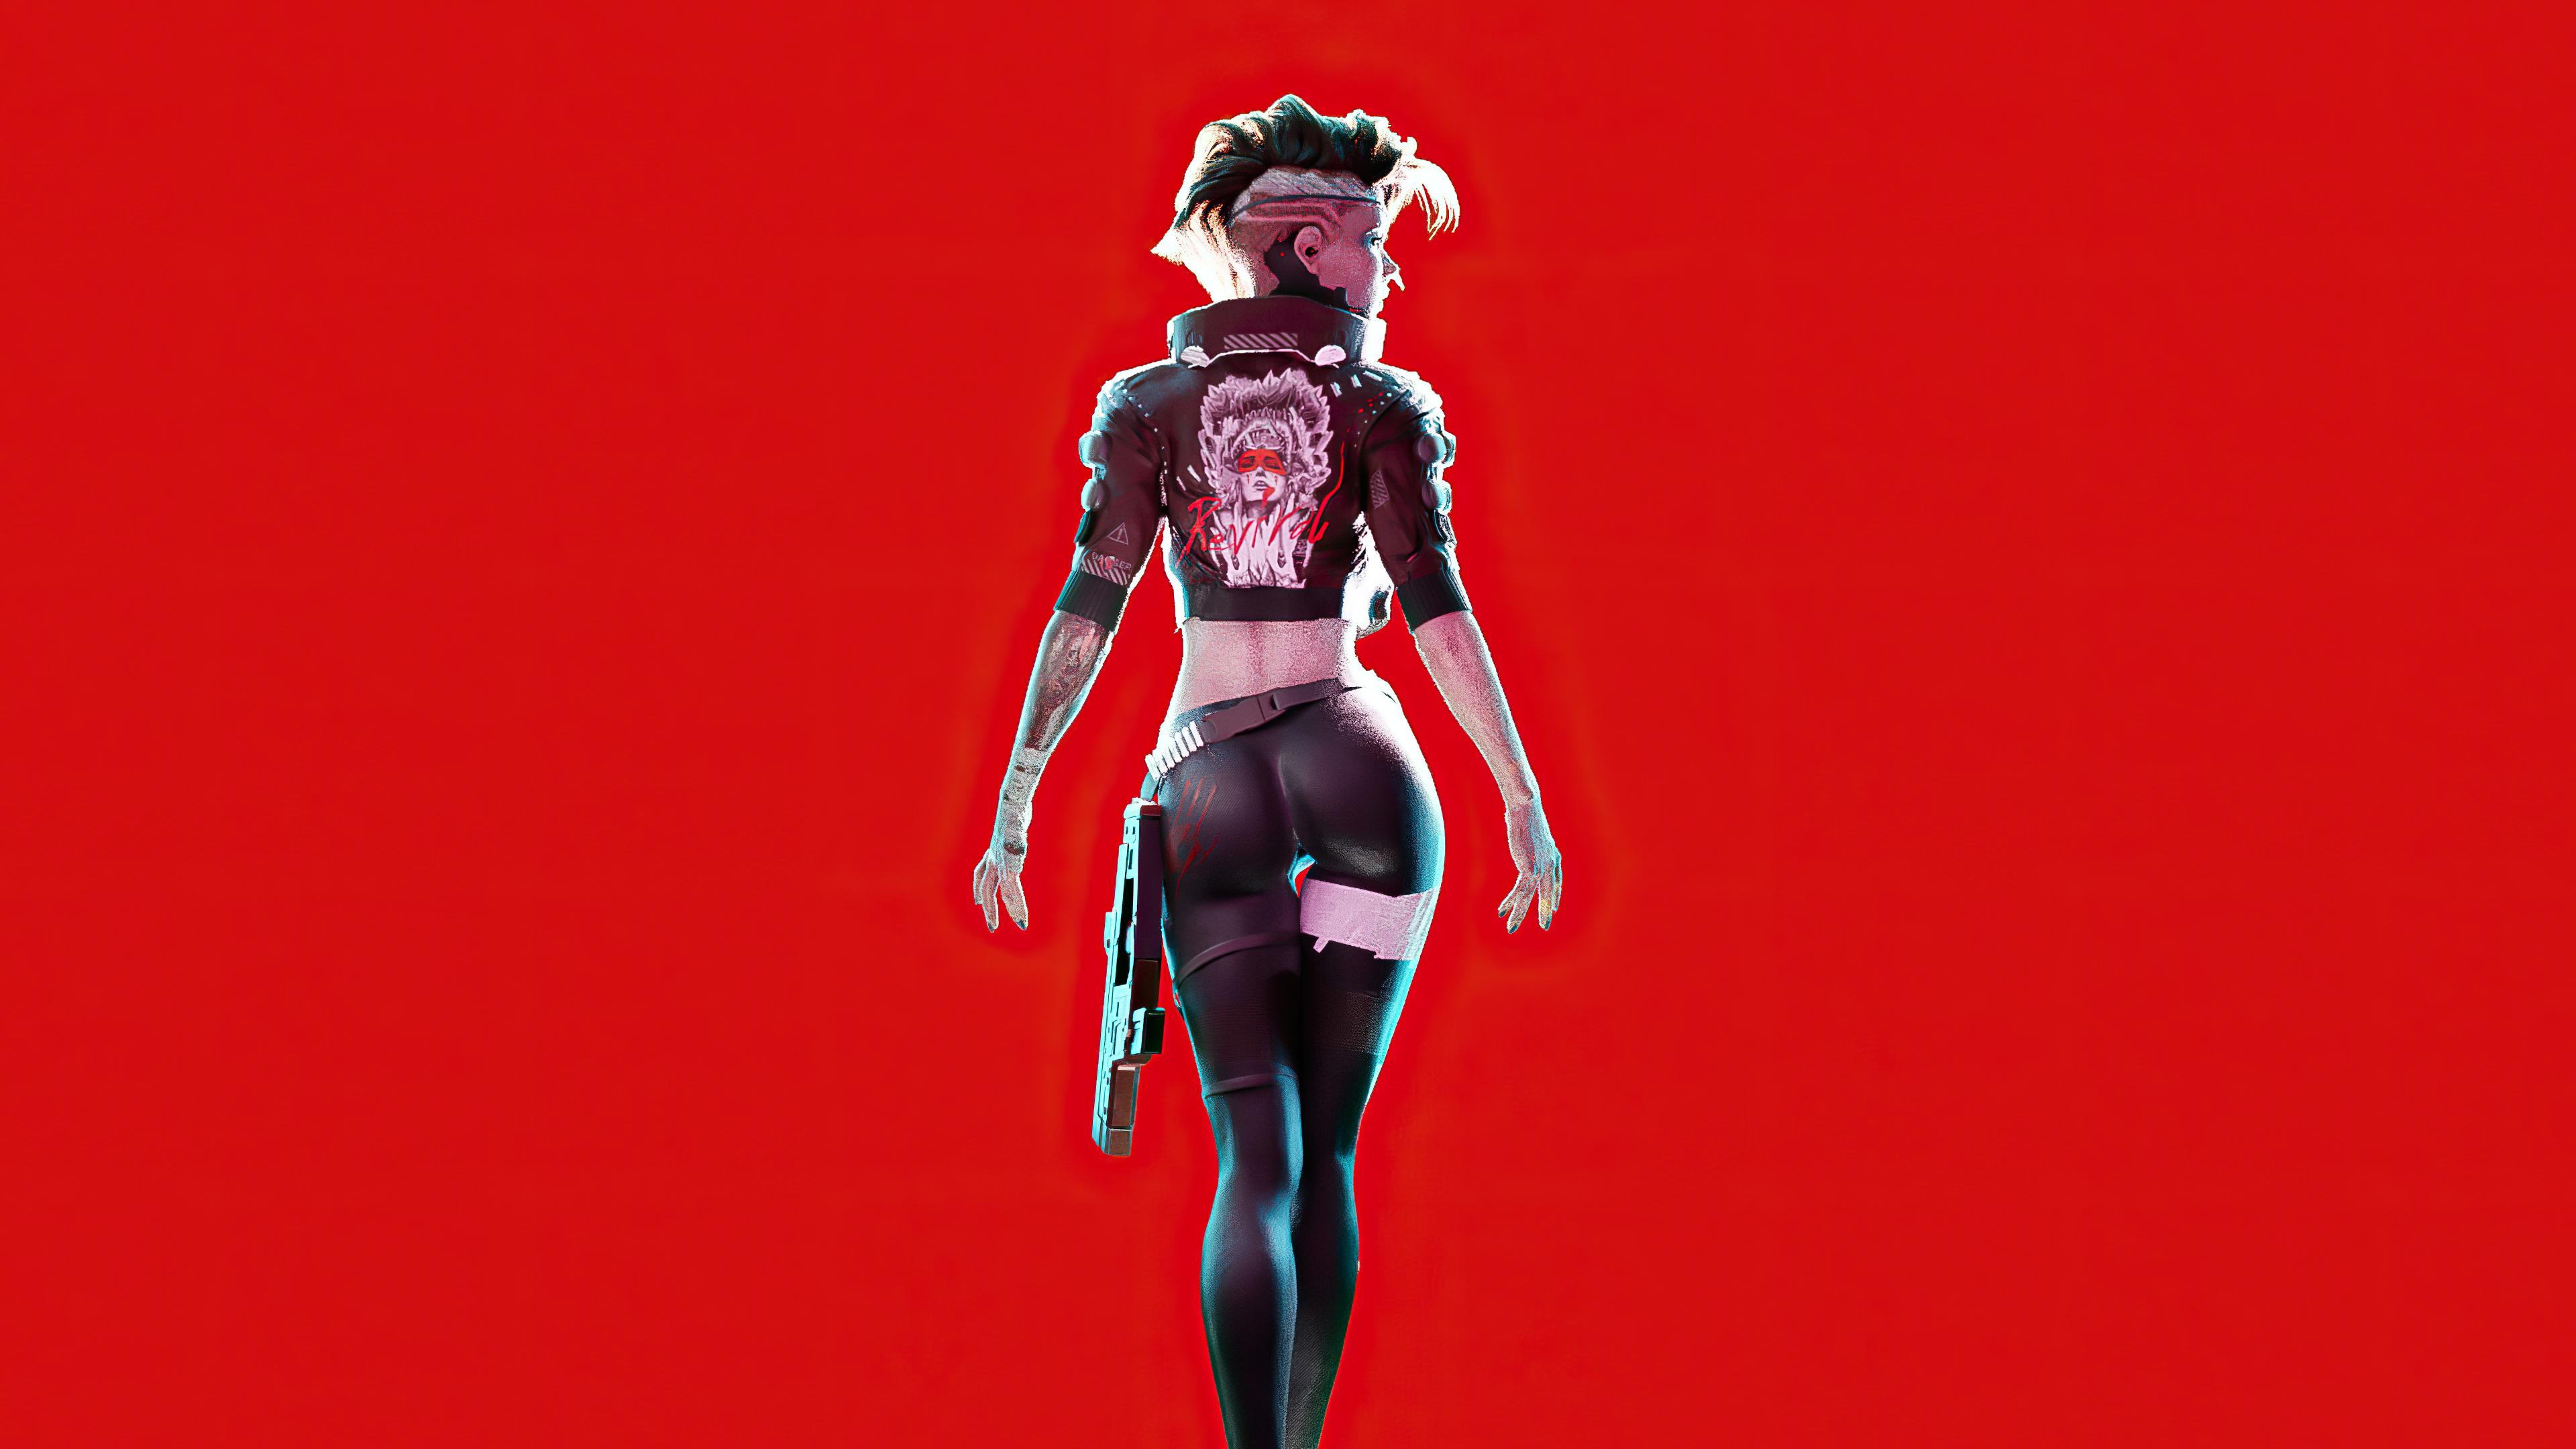 cristian acuna cyber art girl 4k 1608623638 - Cristian Acuna Cyber Art Girl 4k - Cristian Acuna Cyber Art Girl 4k wallpapers